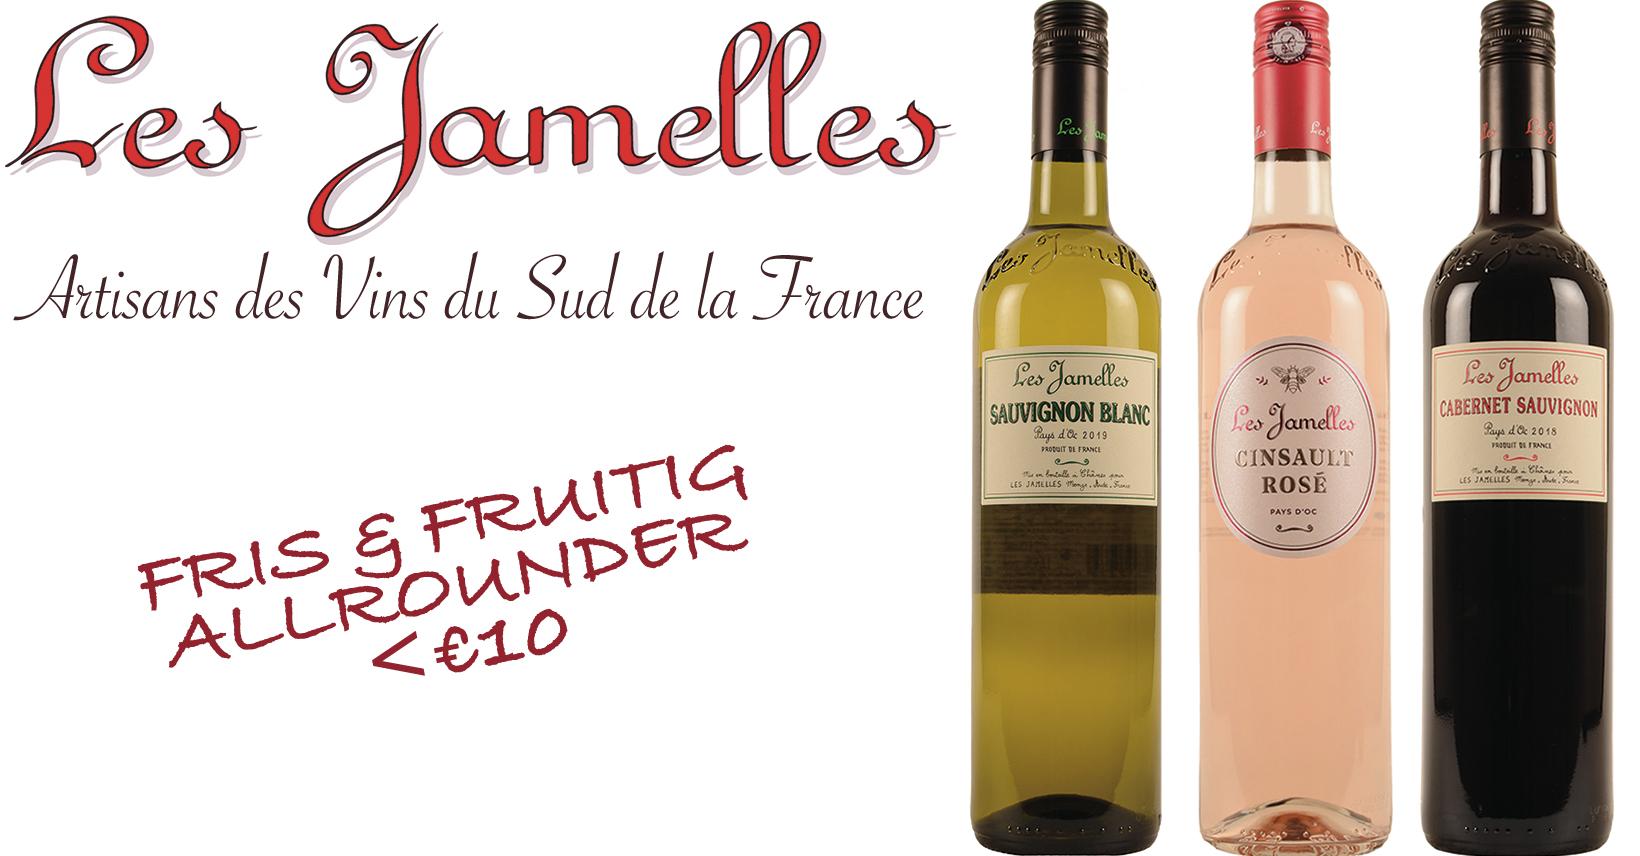 Les Jamelles Promo franse wijn dagdagelijks